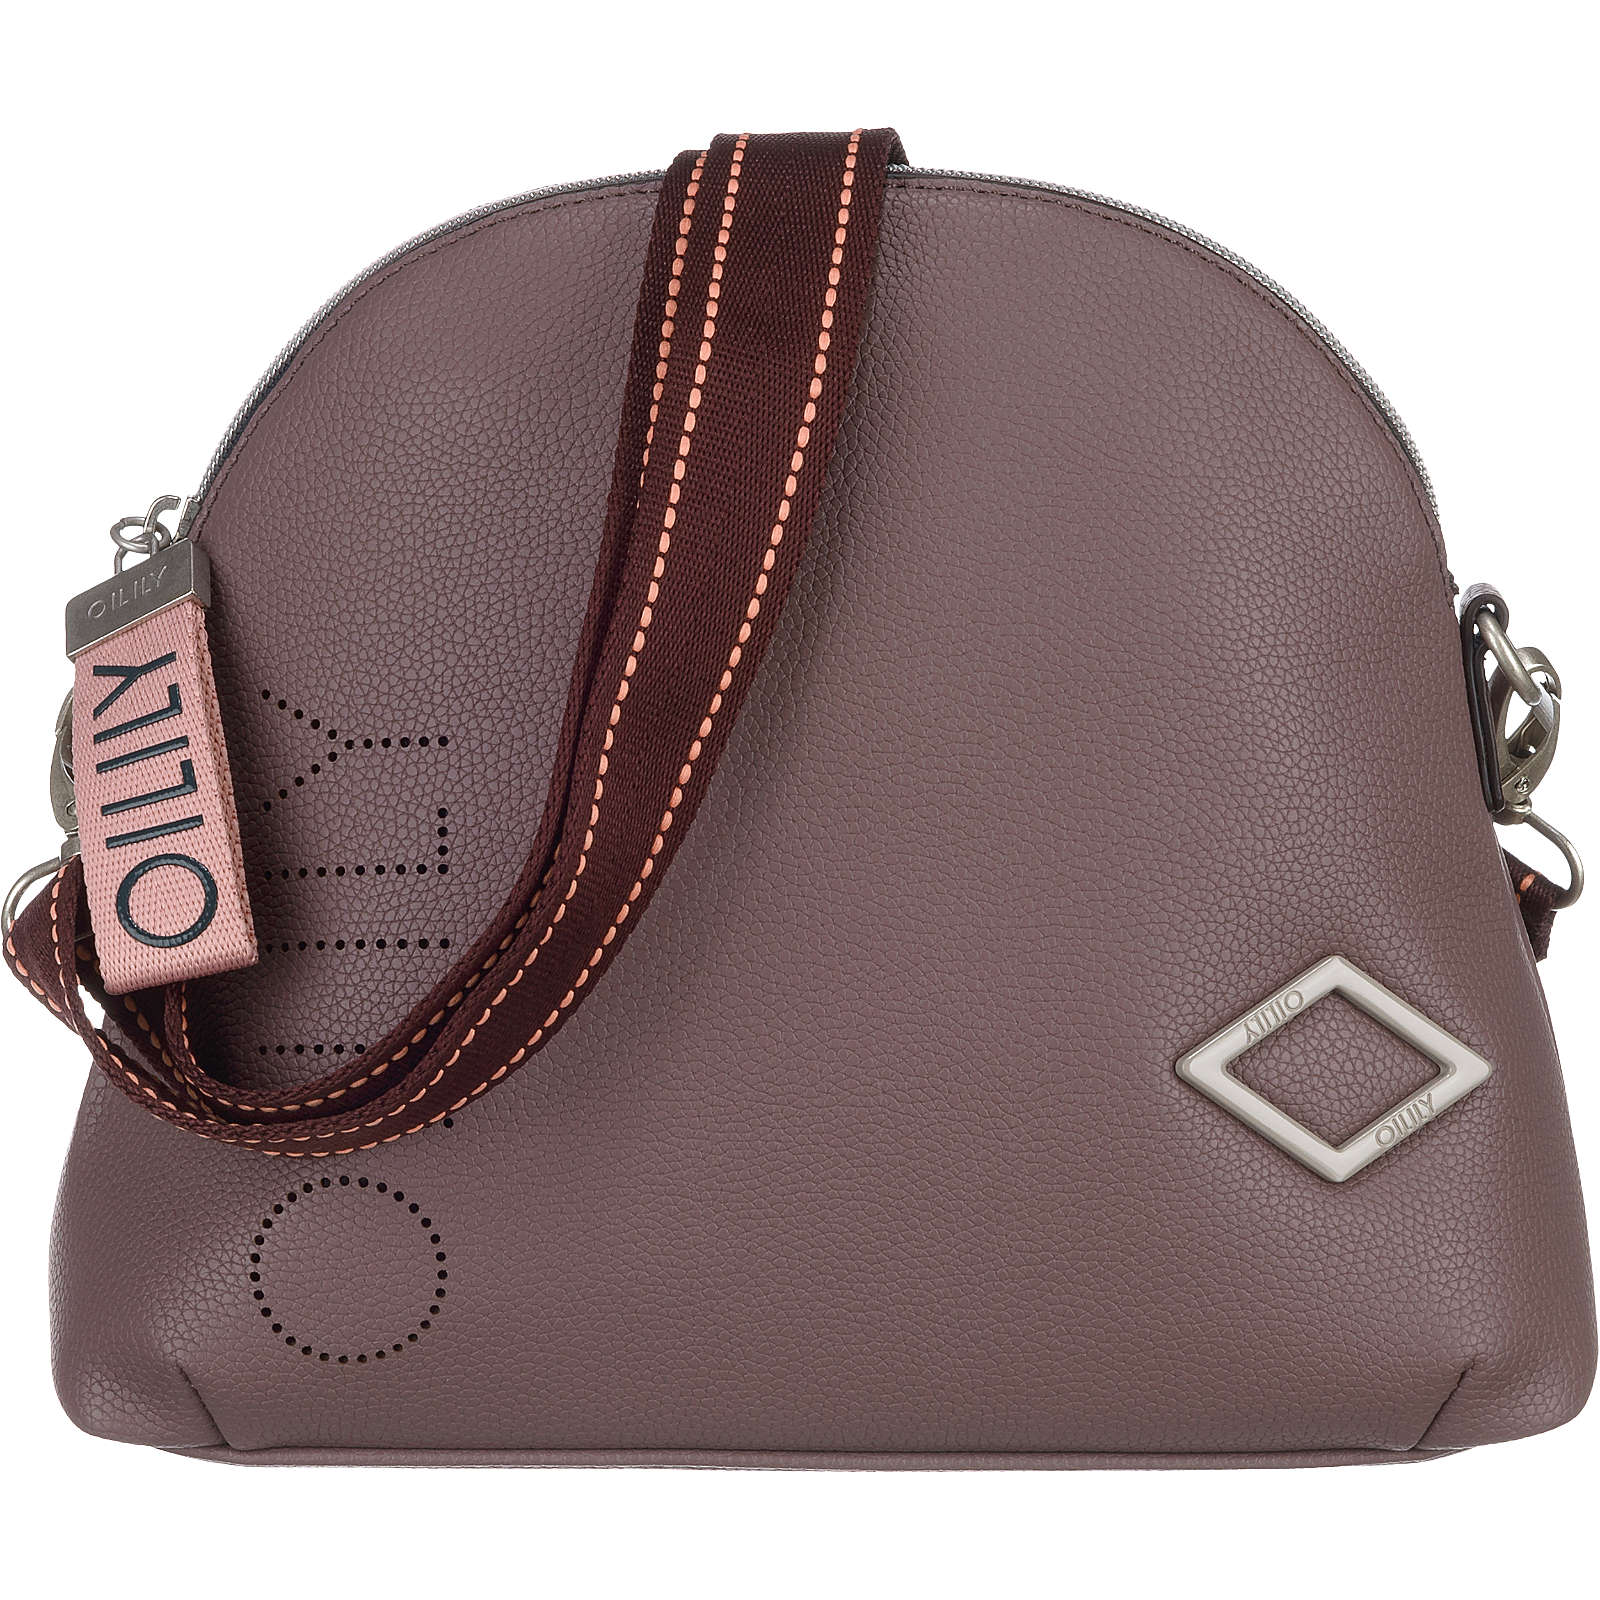 Oilily Airy Handtasche rosa Damen